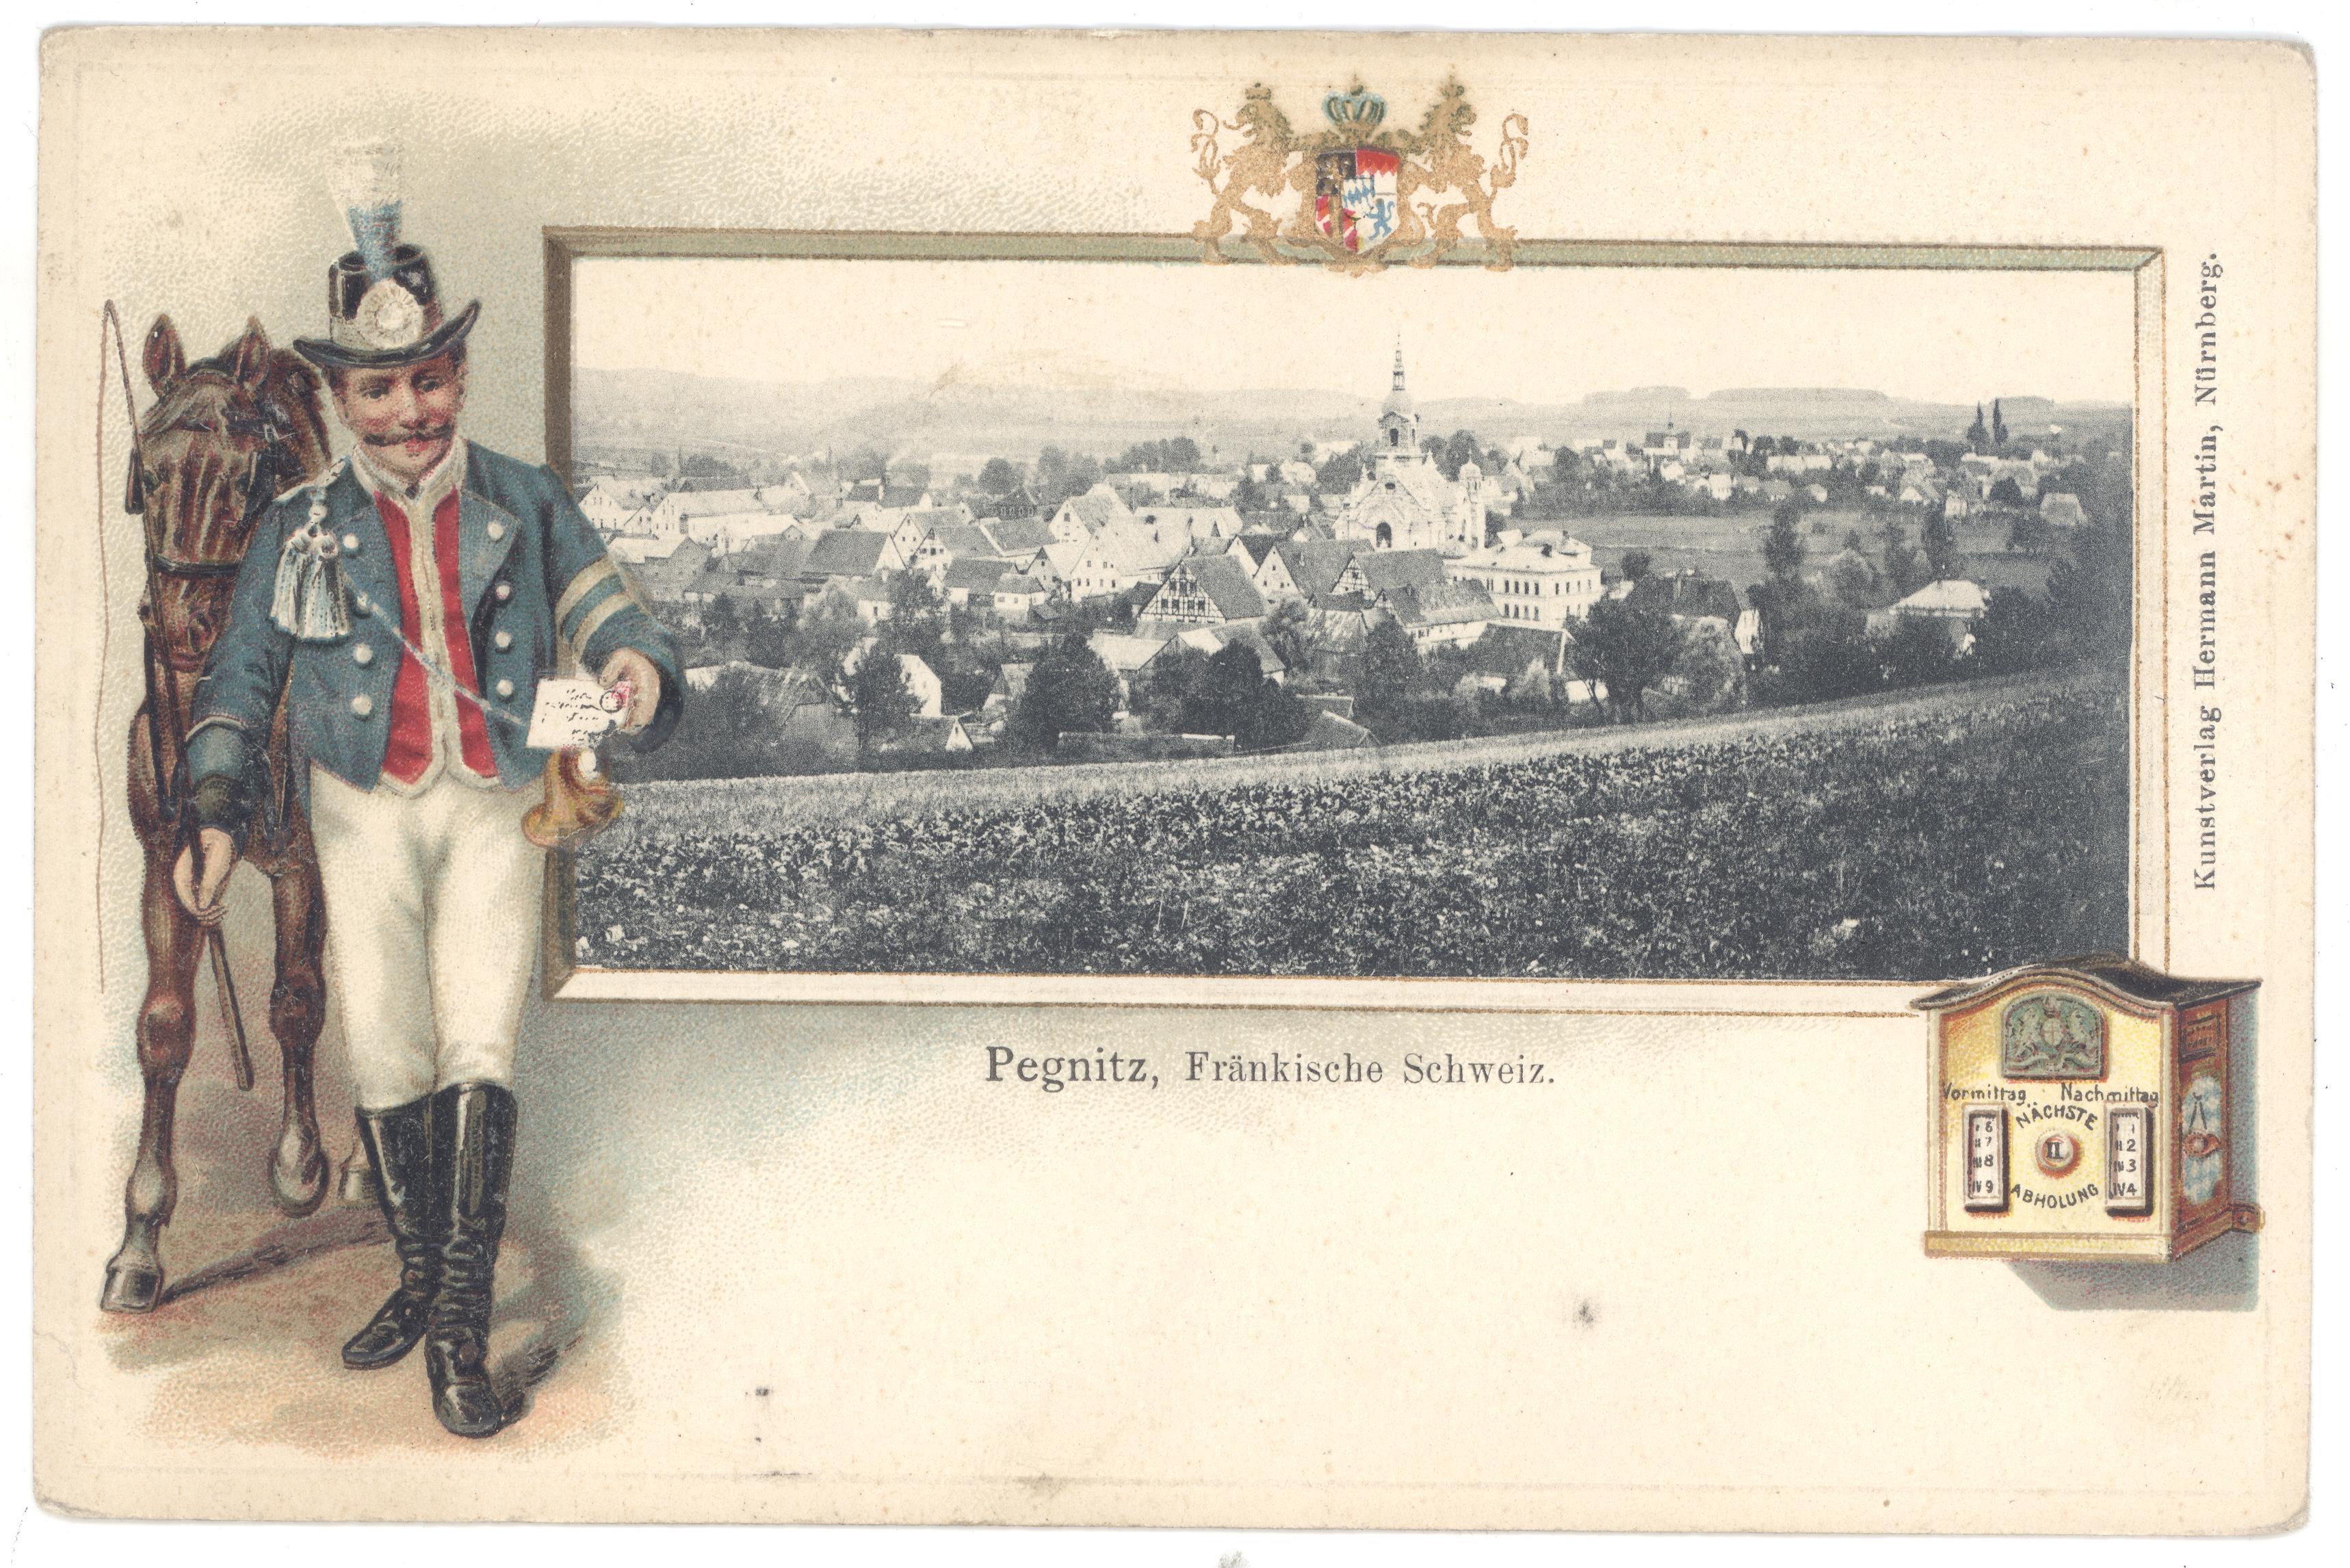 Postkarte 51-undatiert, um 1900 (VS)